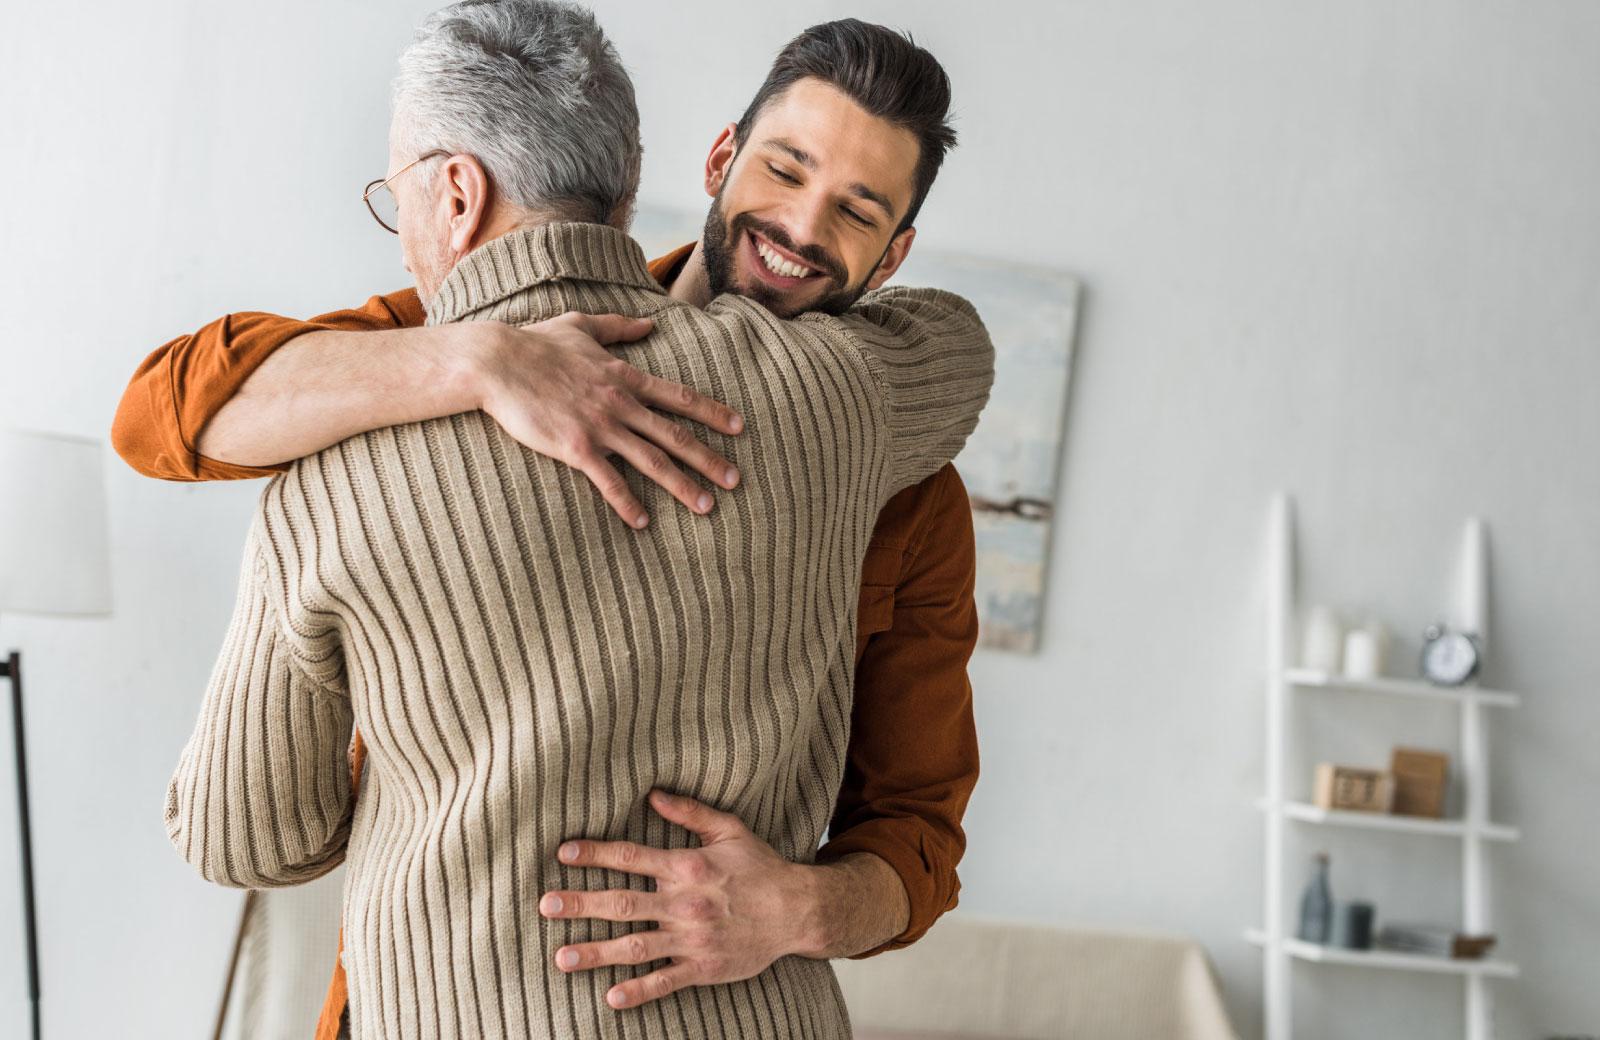 man embracing an older man